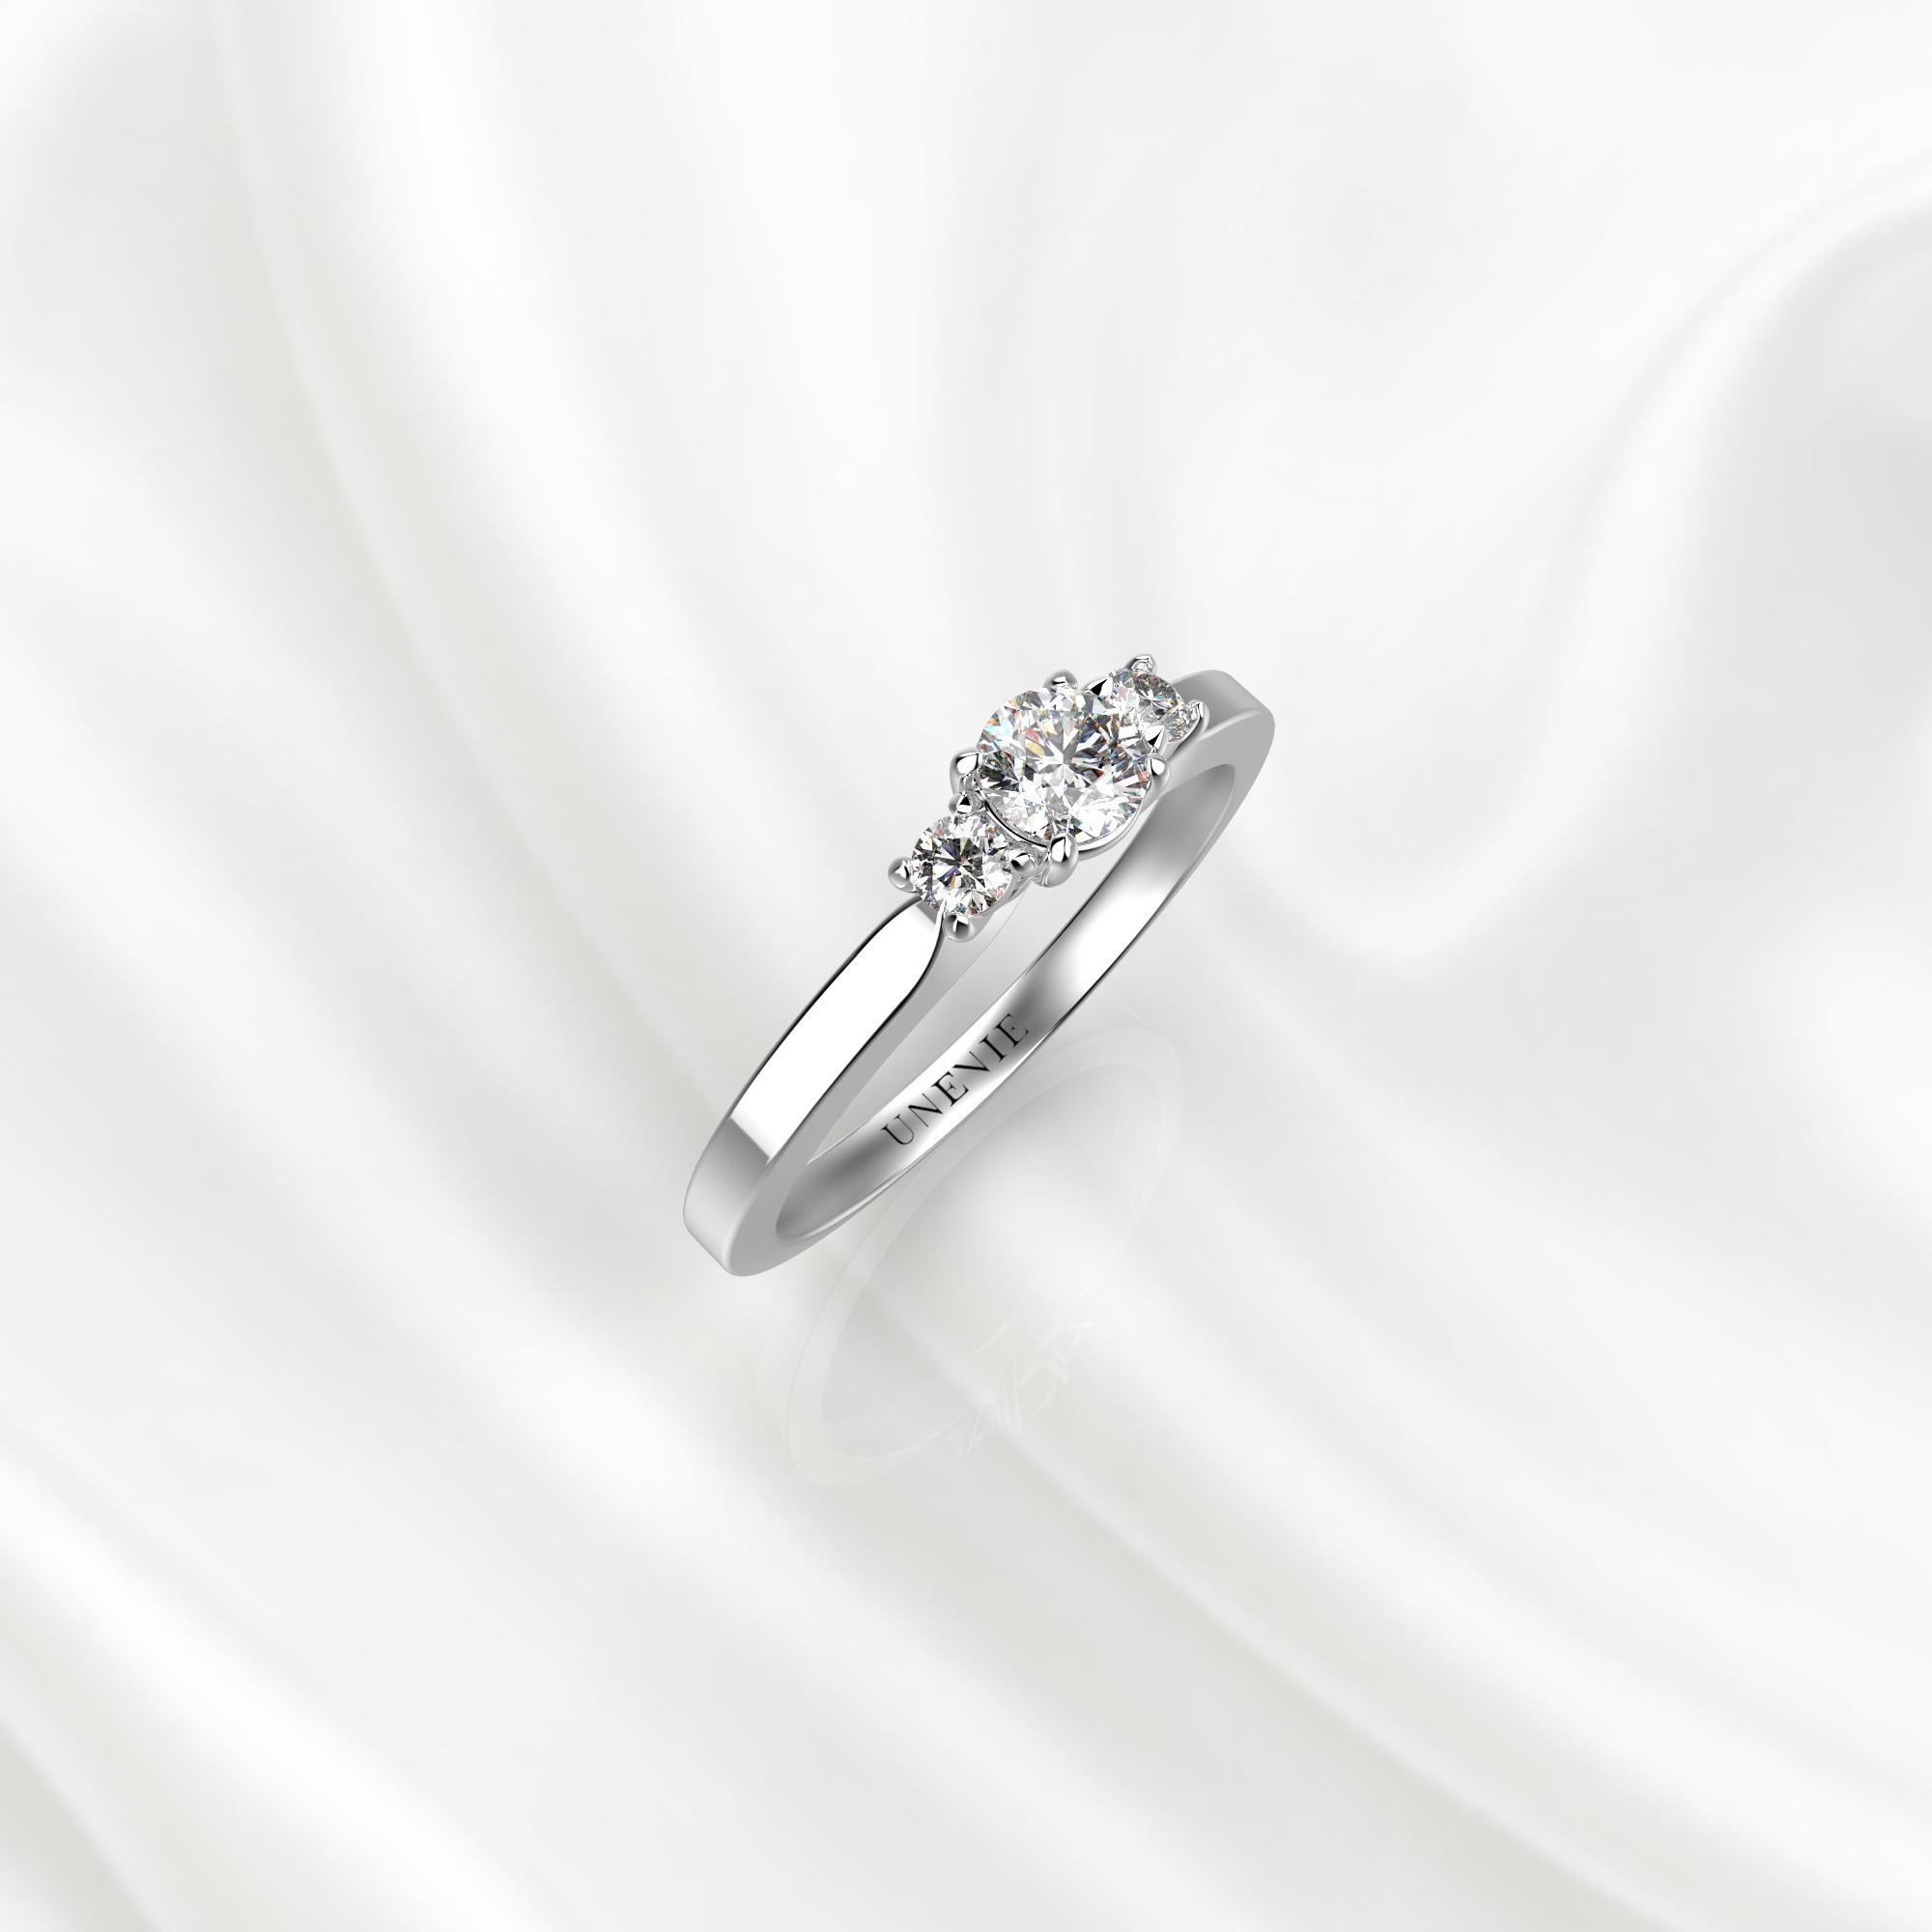 N23 Помолвочное кольцо из белого золота с бриллиантами